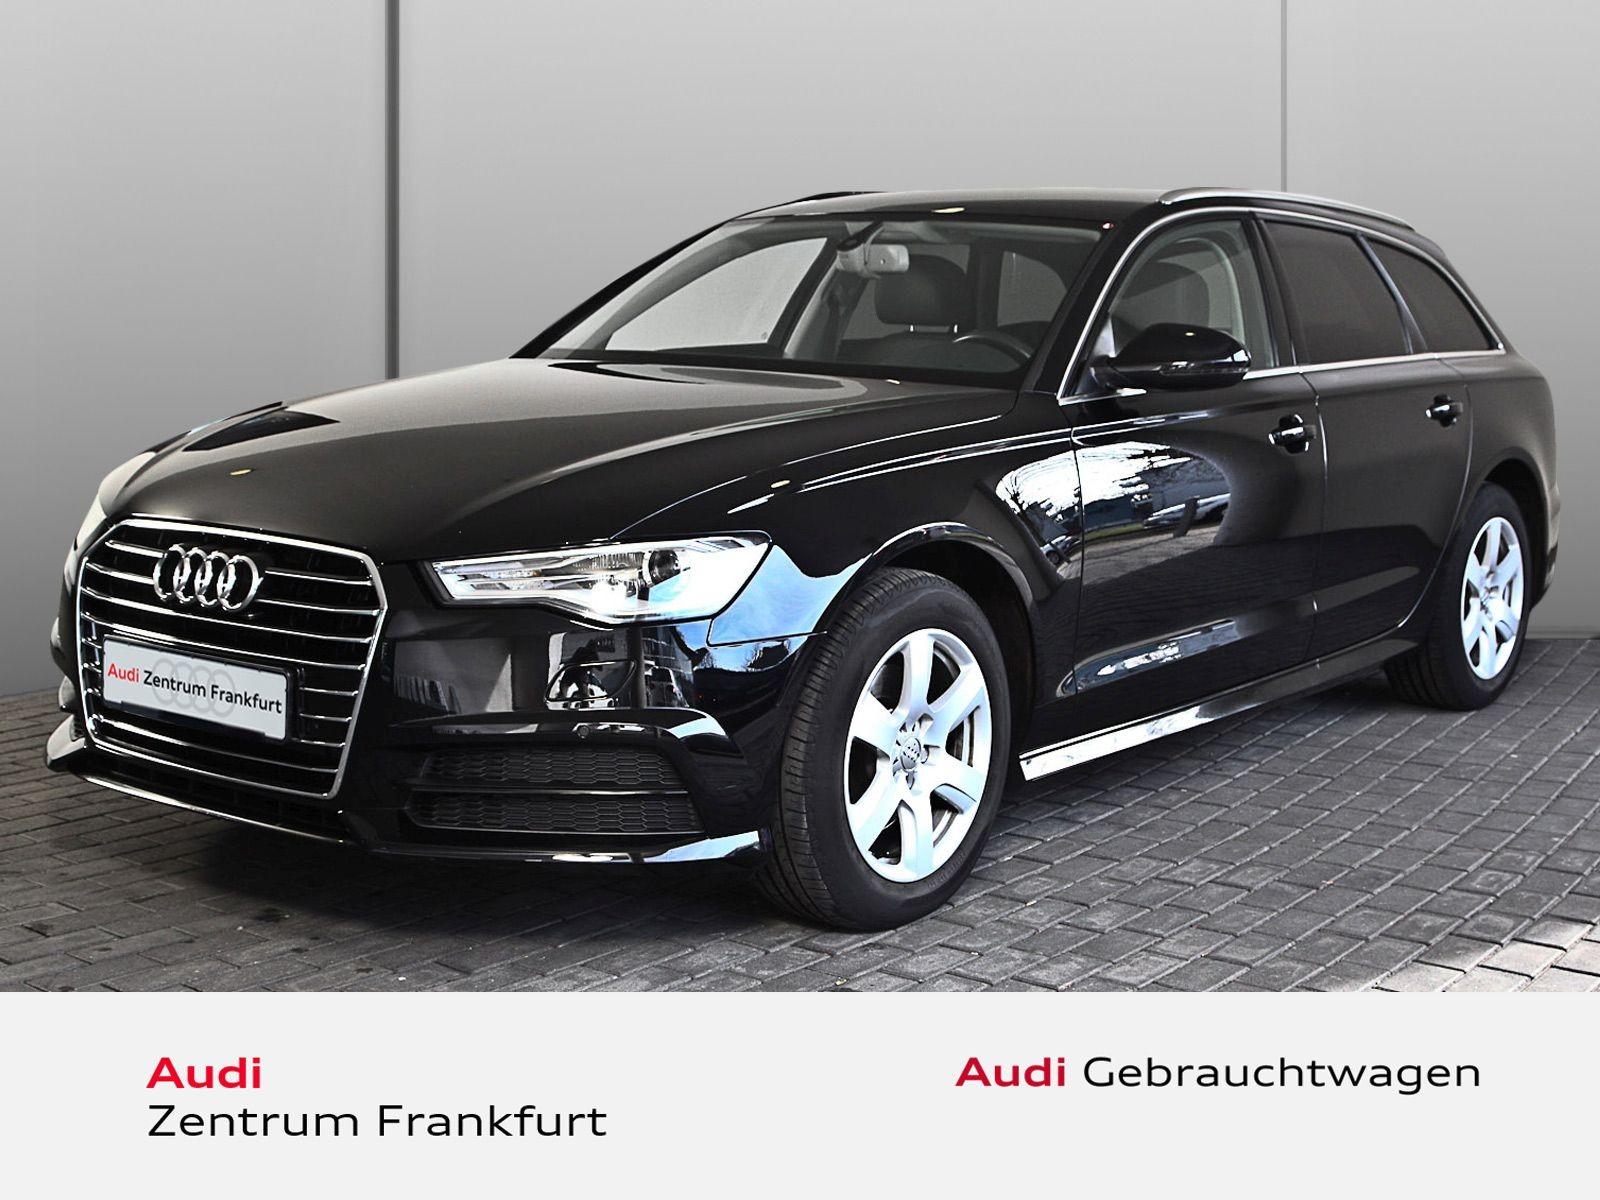 "Audi A6 Avant 2.0 TDI ultra S tronic Navi PDC Alu17"" Xenon Sitzheizung, Jahr 2017, diesel"